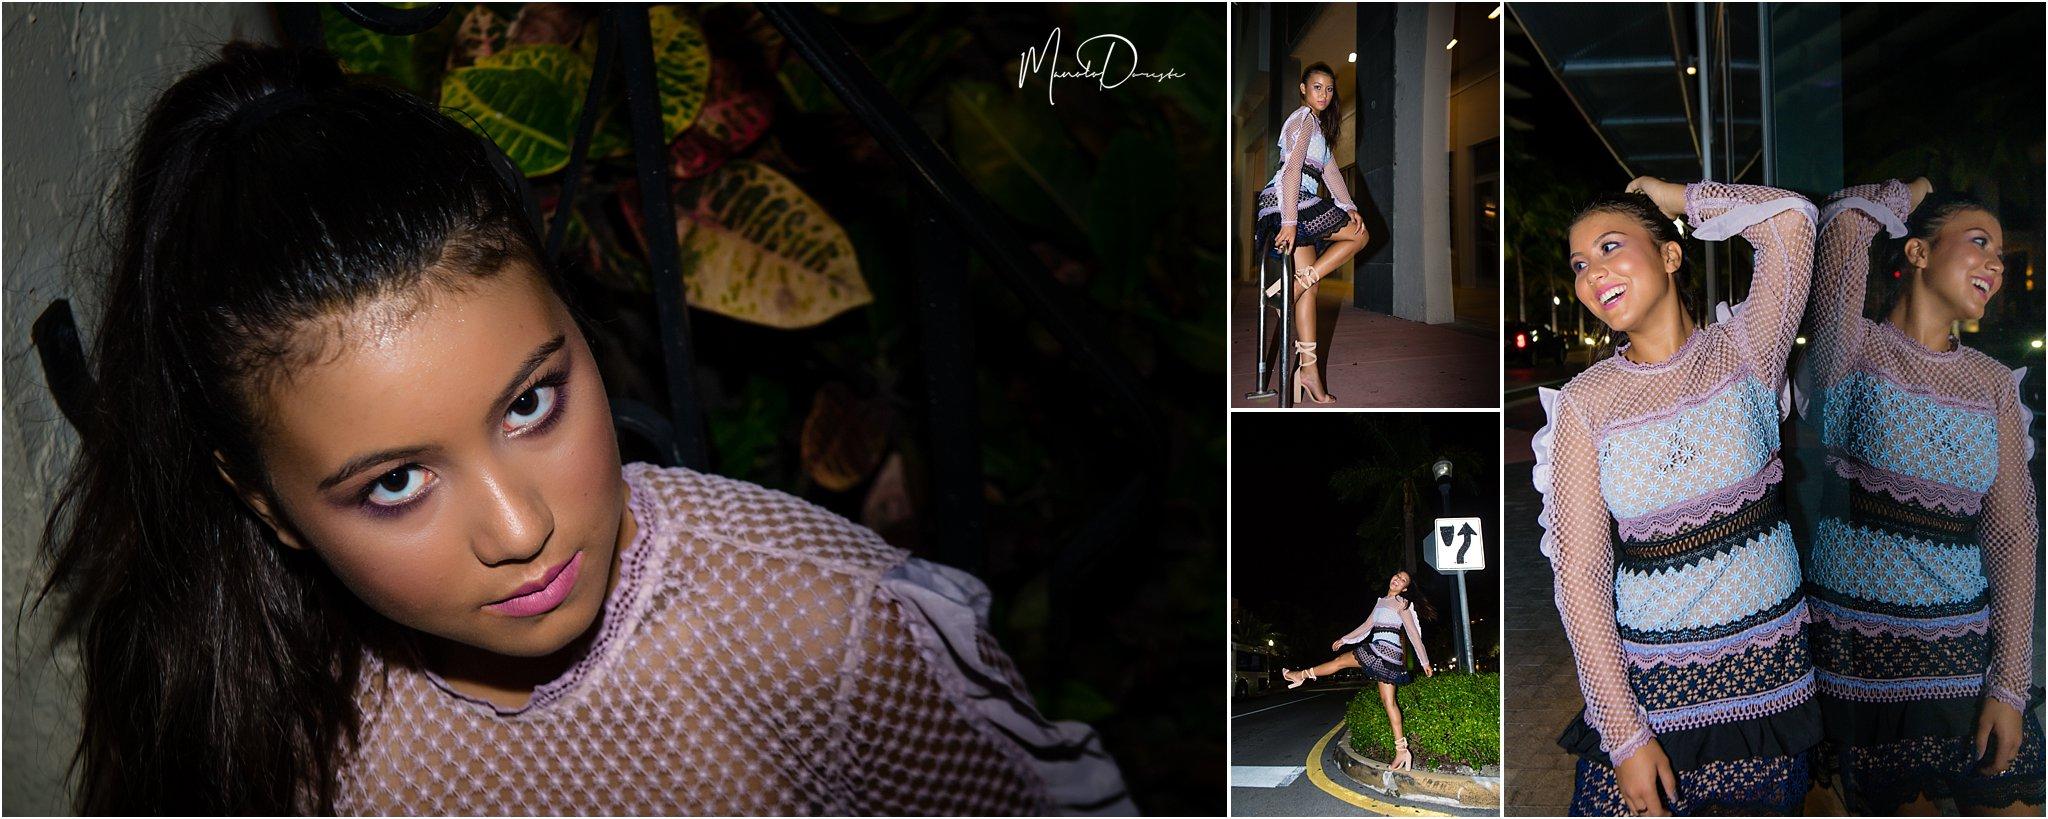 0250_ManoloDoreste_InFocusStudios_Wedding_Family_Photography_Miami_MiamiPhotographer.jpg